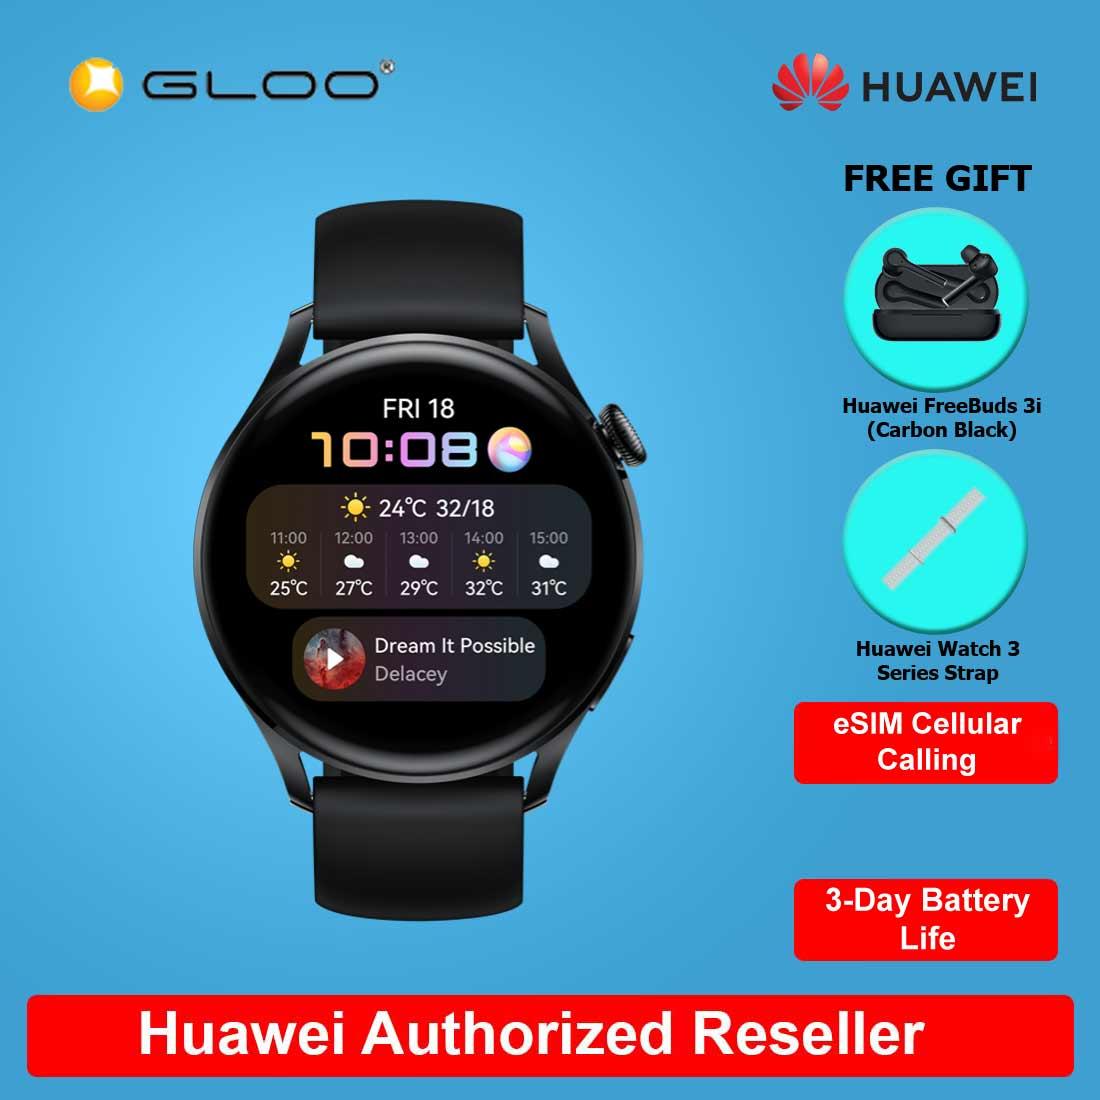 [Pre-order] Huawei Watch 3 FREE Huawei FreeBuds 3i Carbon Black + Huawei Watch 3 Series Strap (ETA:15.7.2021)